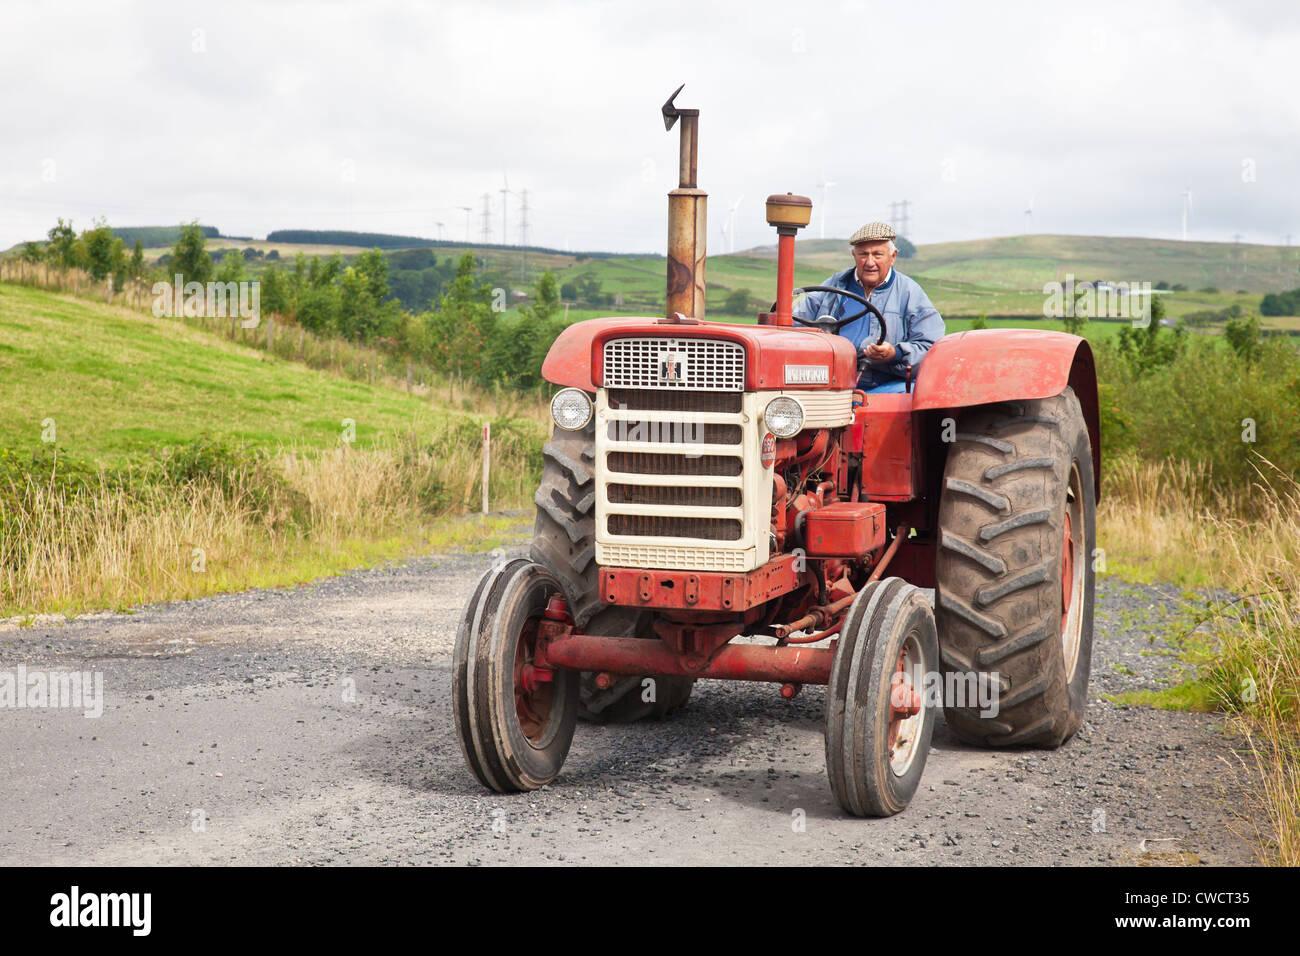 Old International Harvester : Enthusiast driving a red vintage international harvester